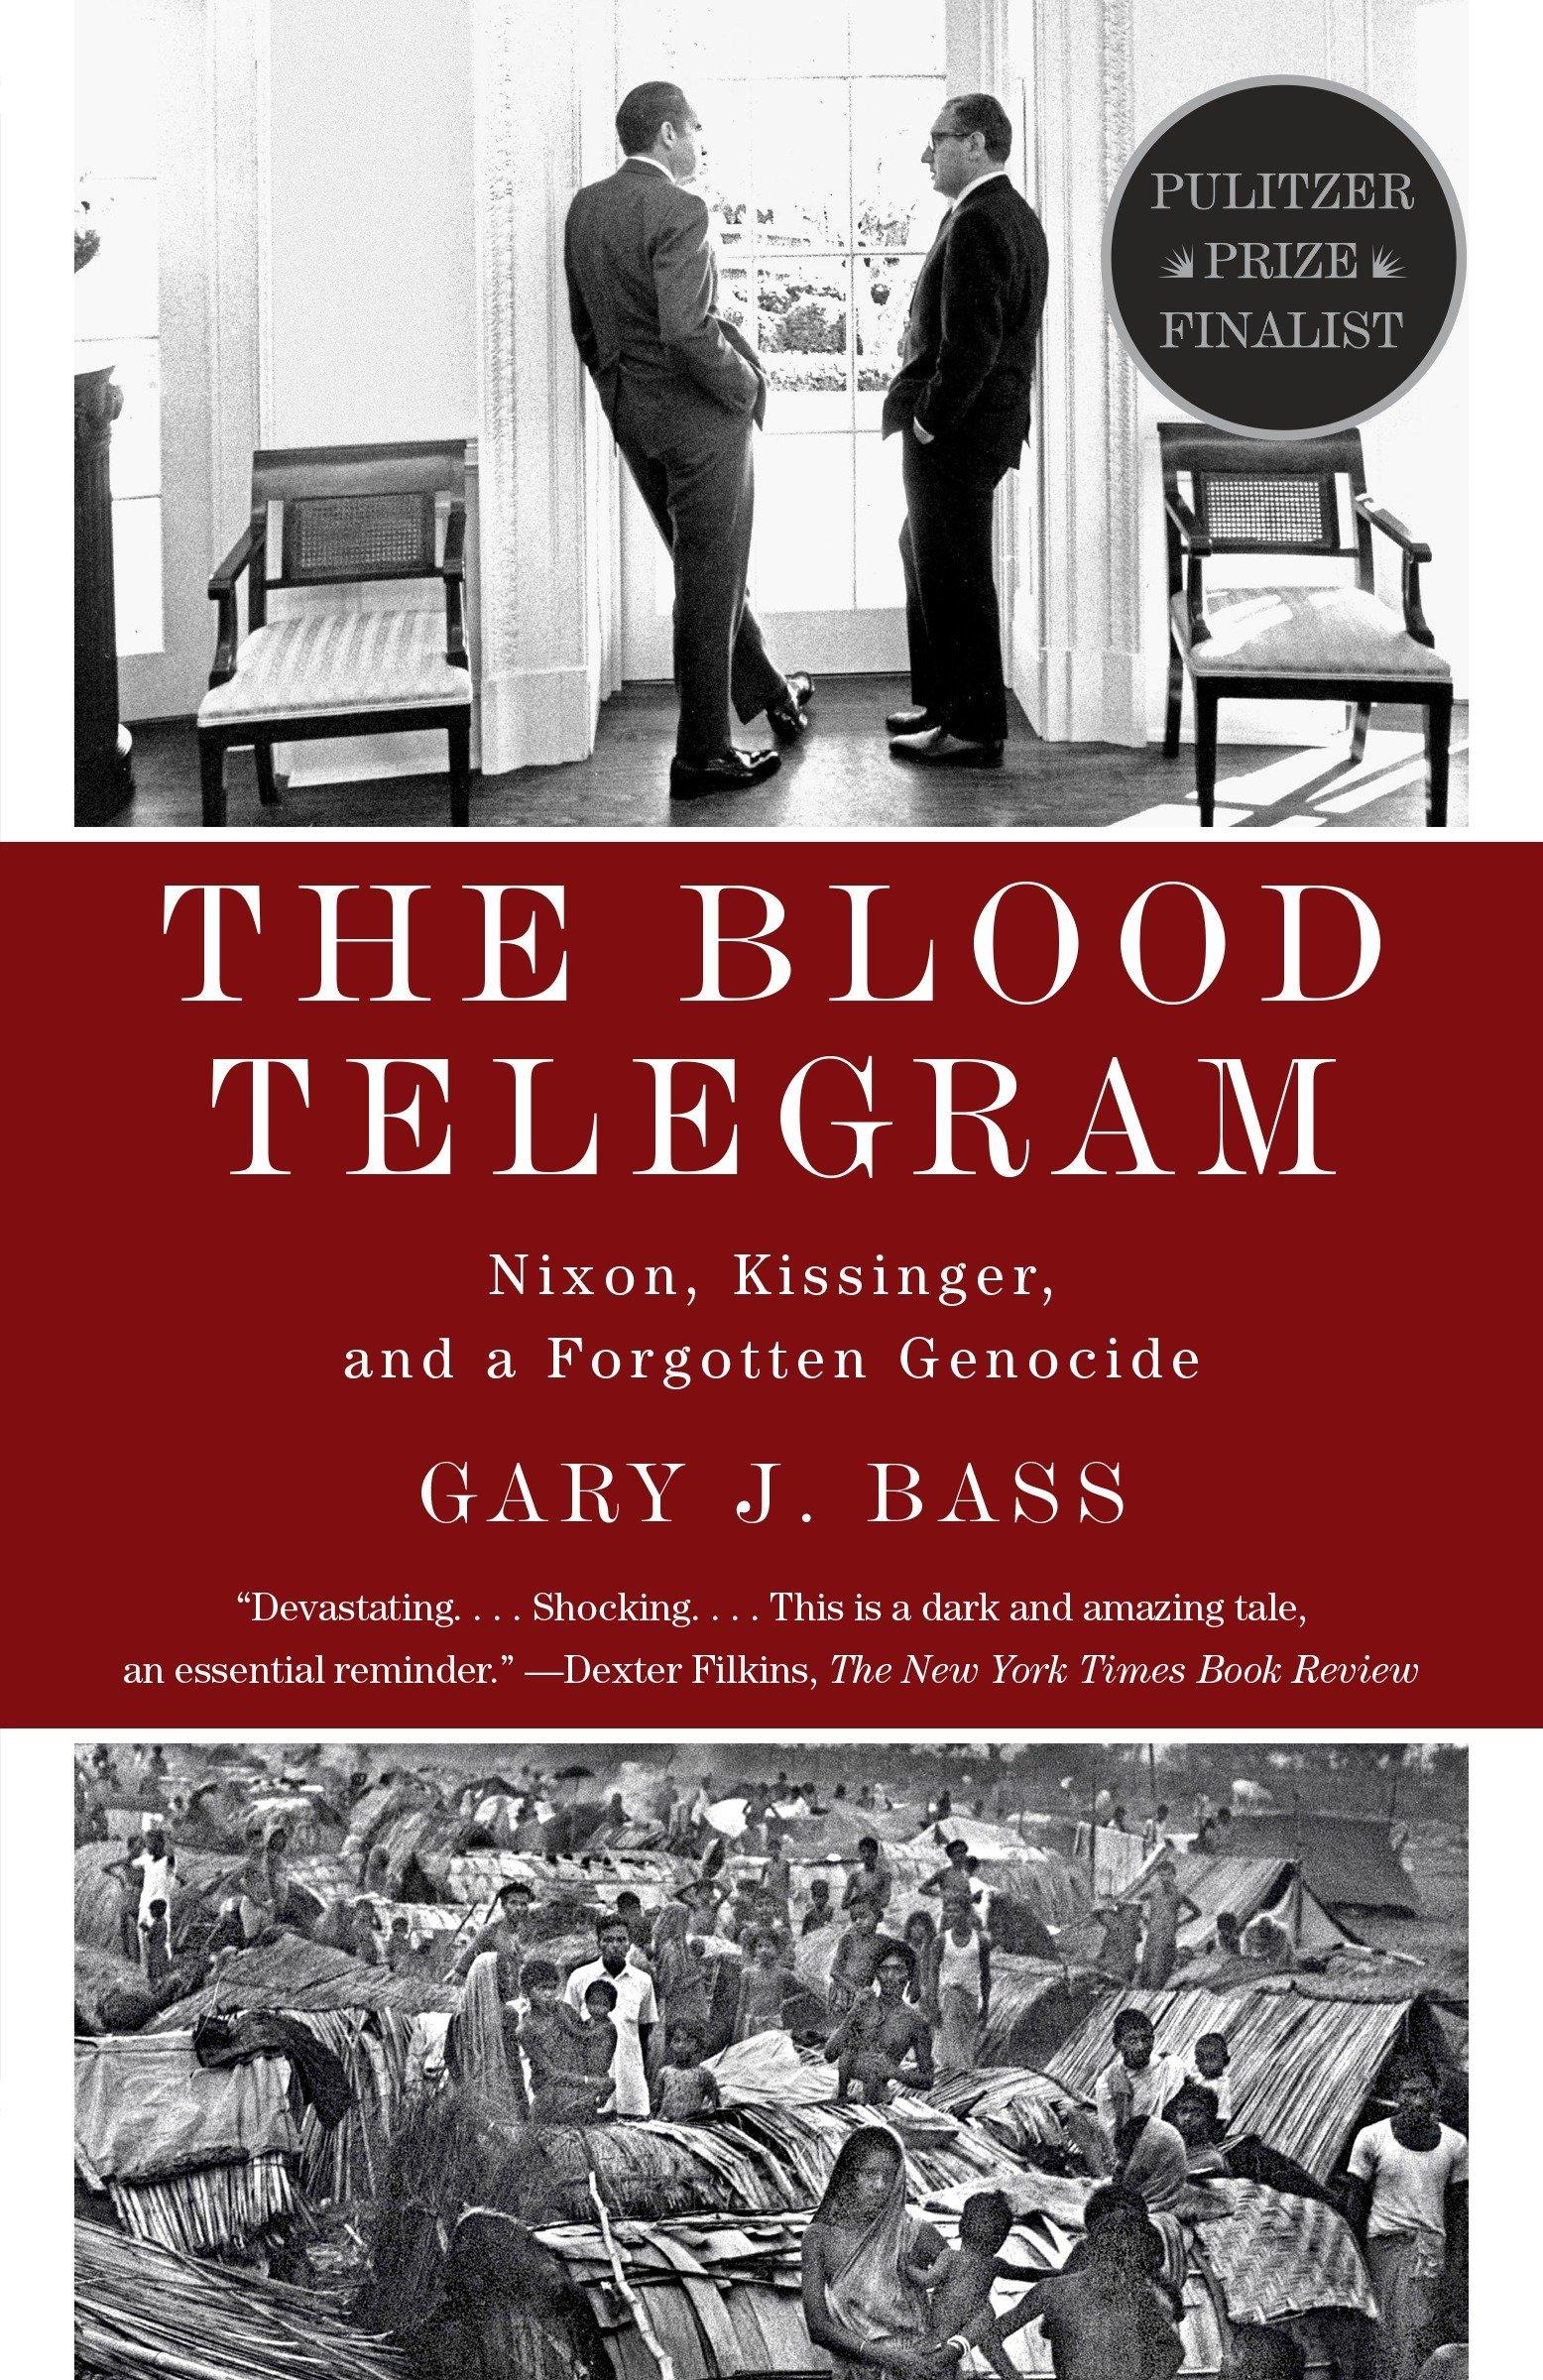 The Blood Telegram: Nixon, Kissinger, and a Forgotten